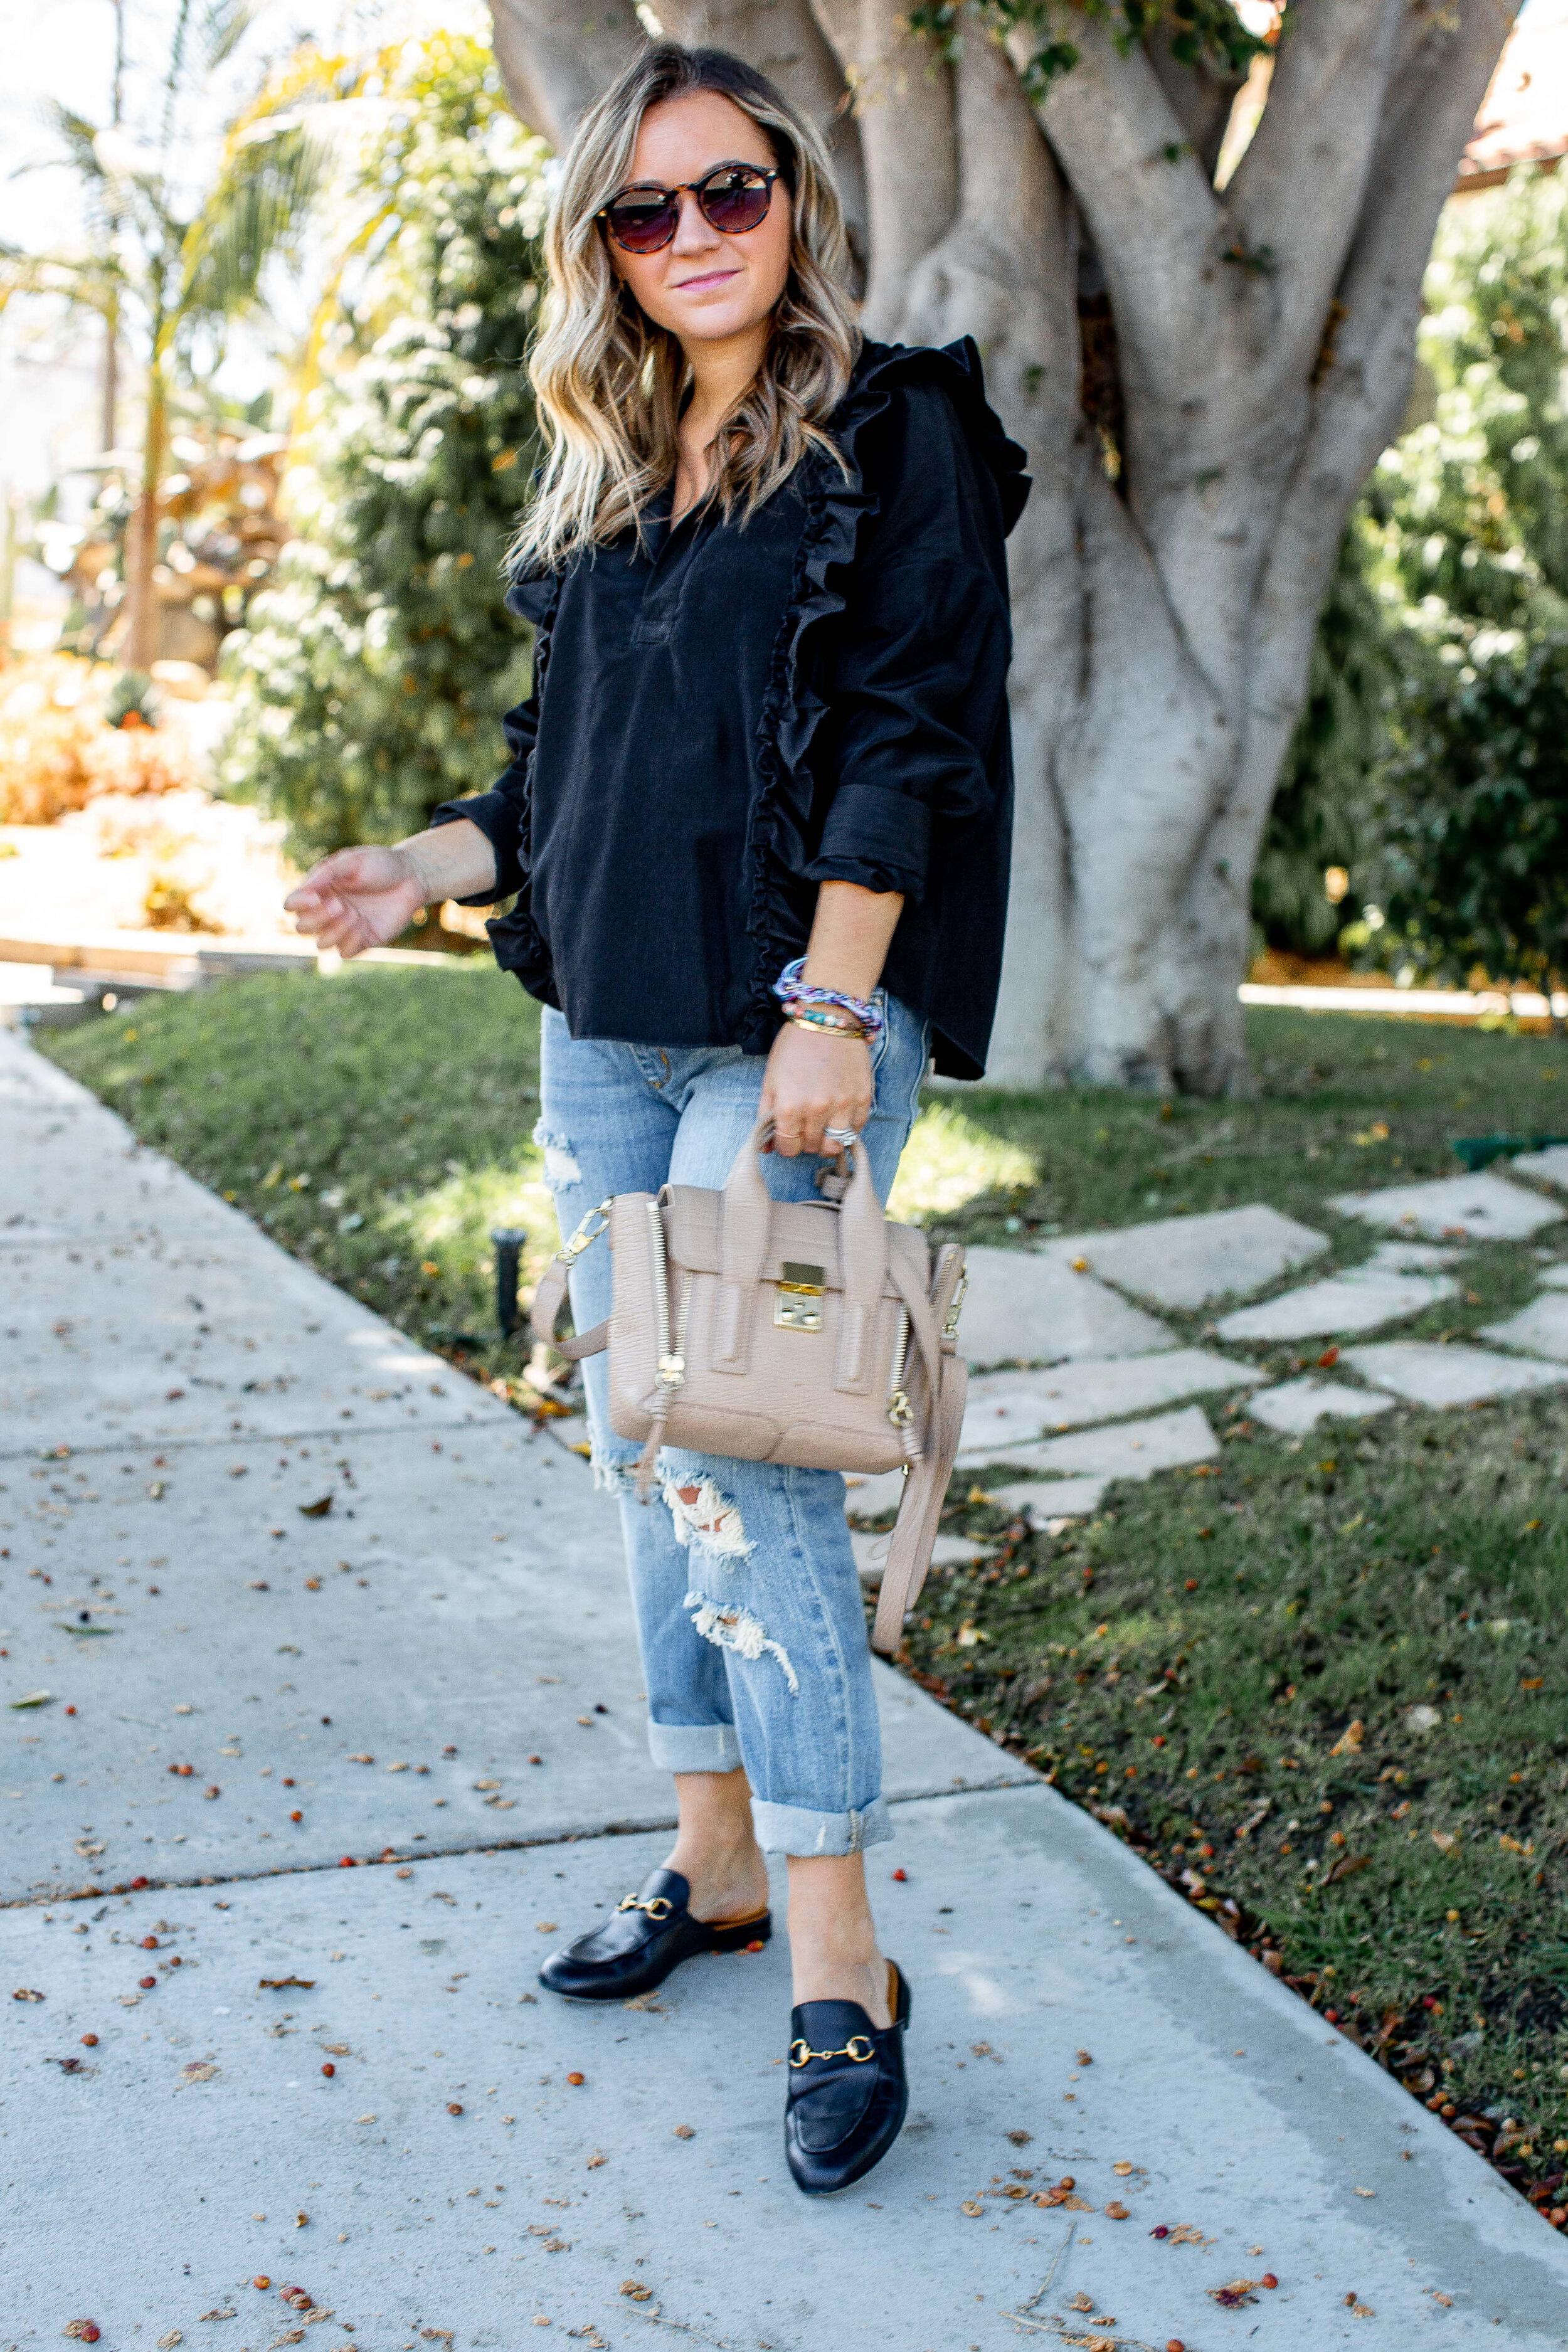 fizz-fade-bf-maternity-jeans-4.jpg